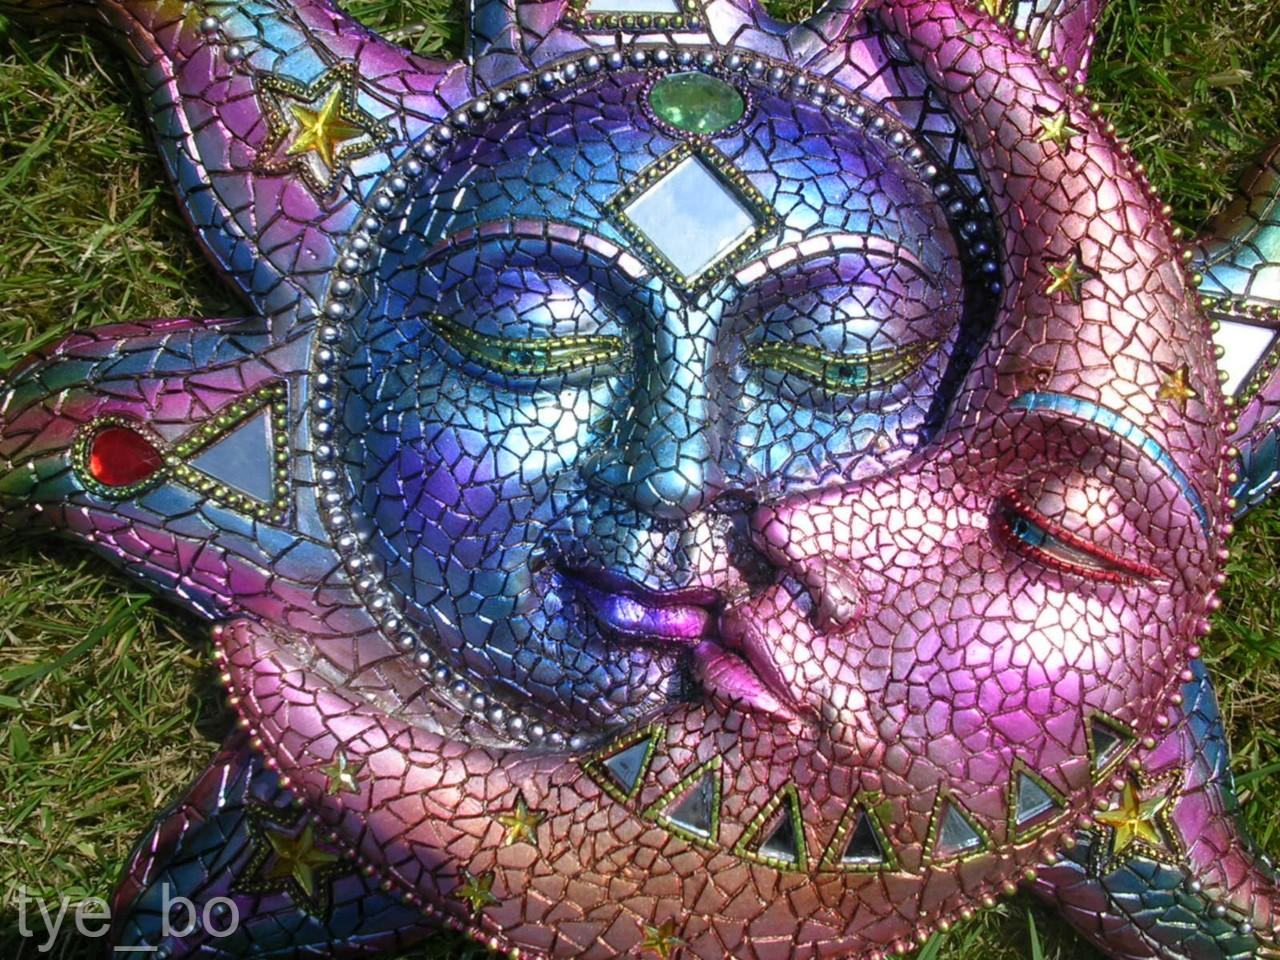 moon kiss mosaic plaque sun moon garden ornament ebay. Black Bedroom Furniture Sets. Home Design Ideas